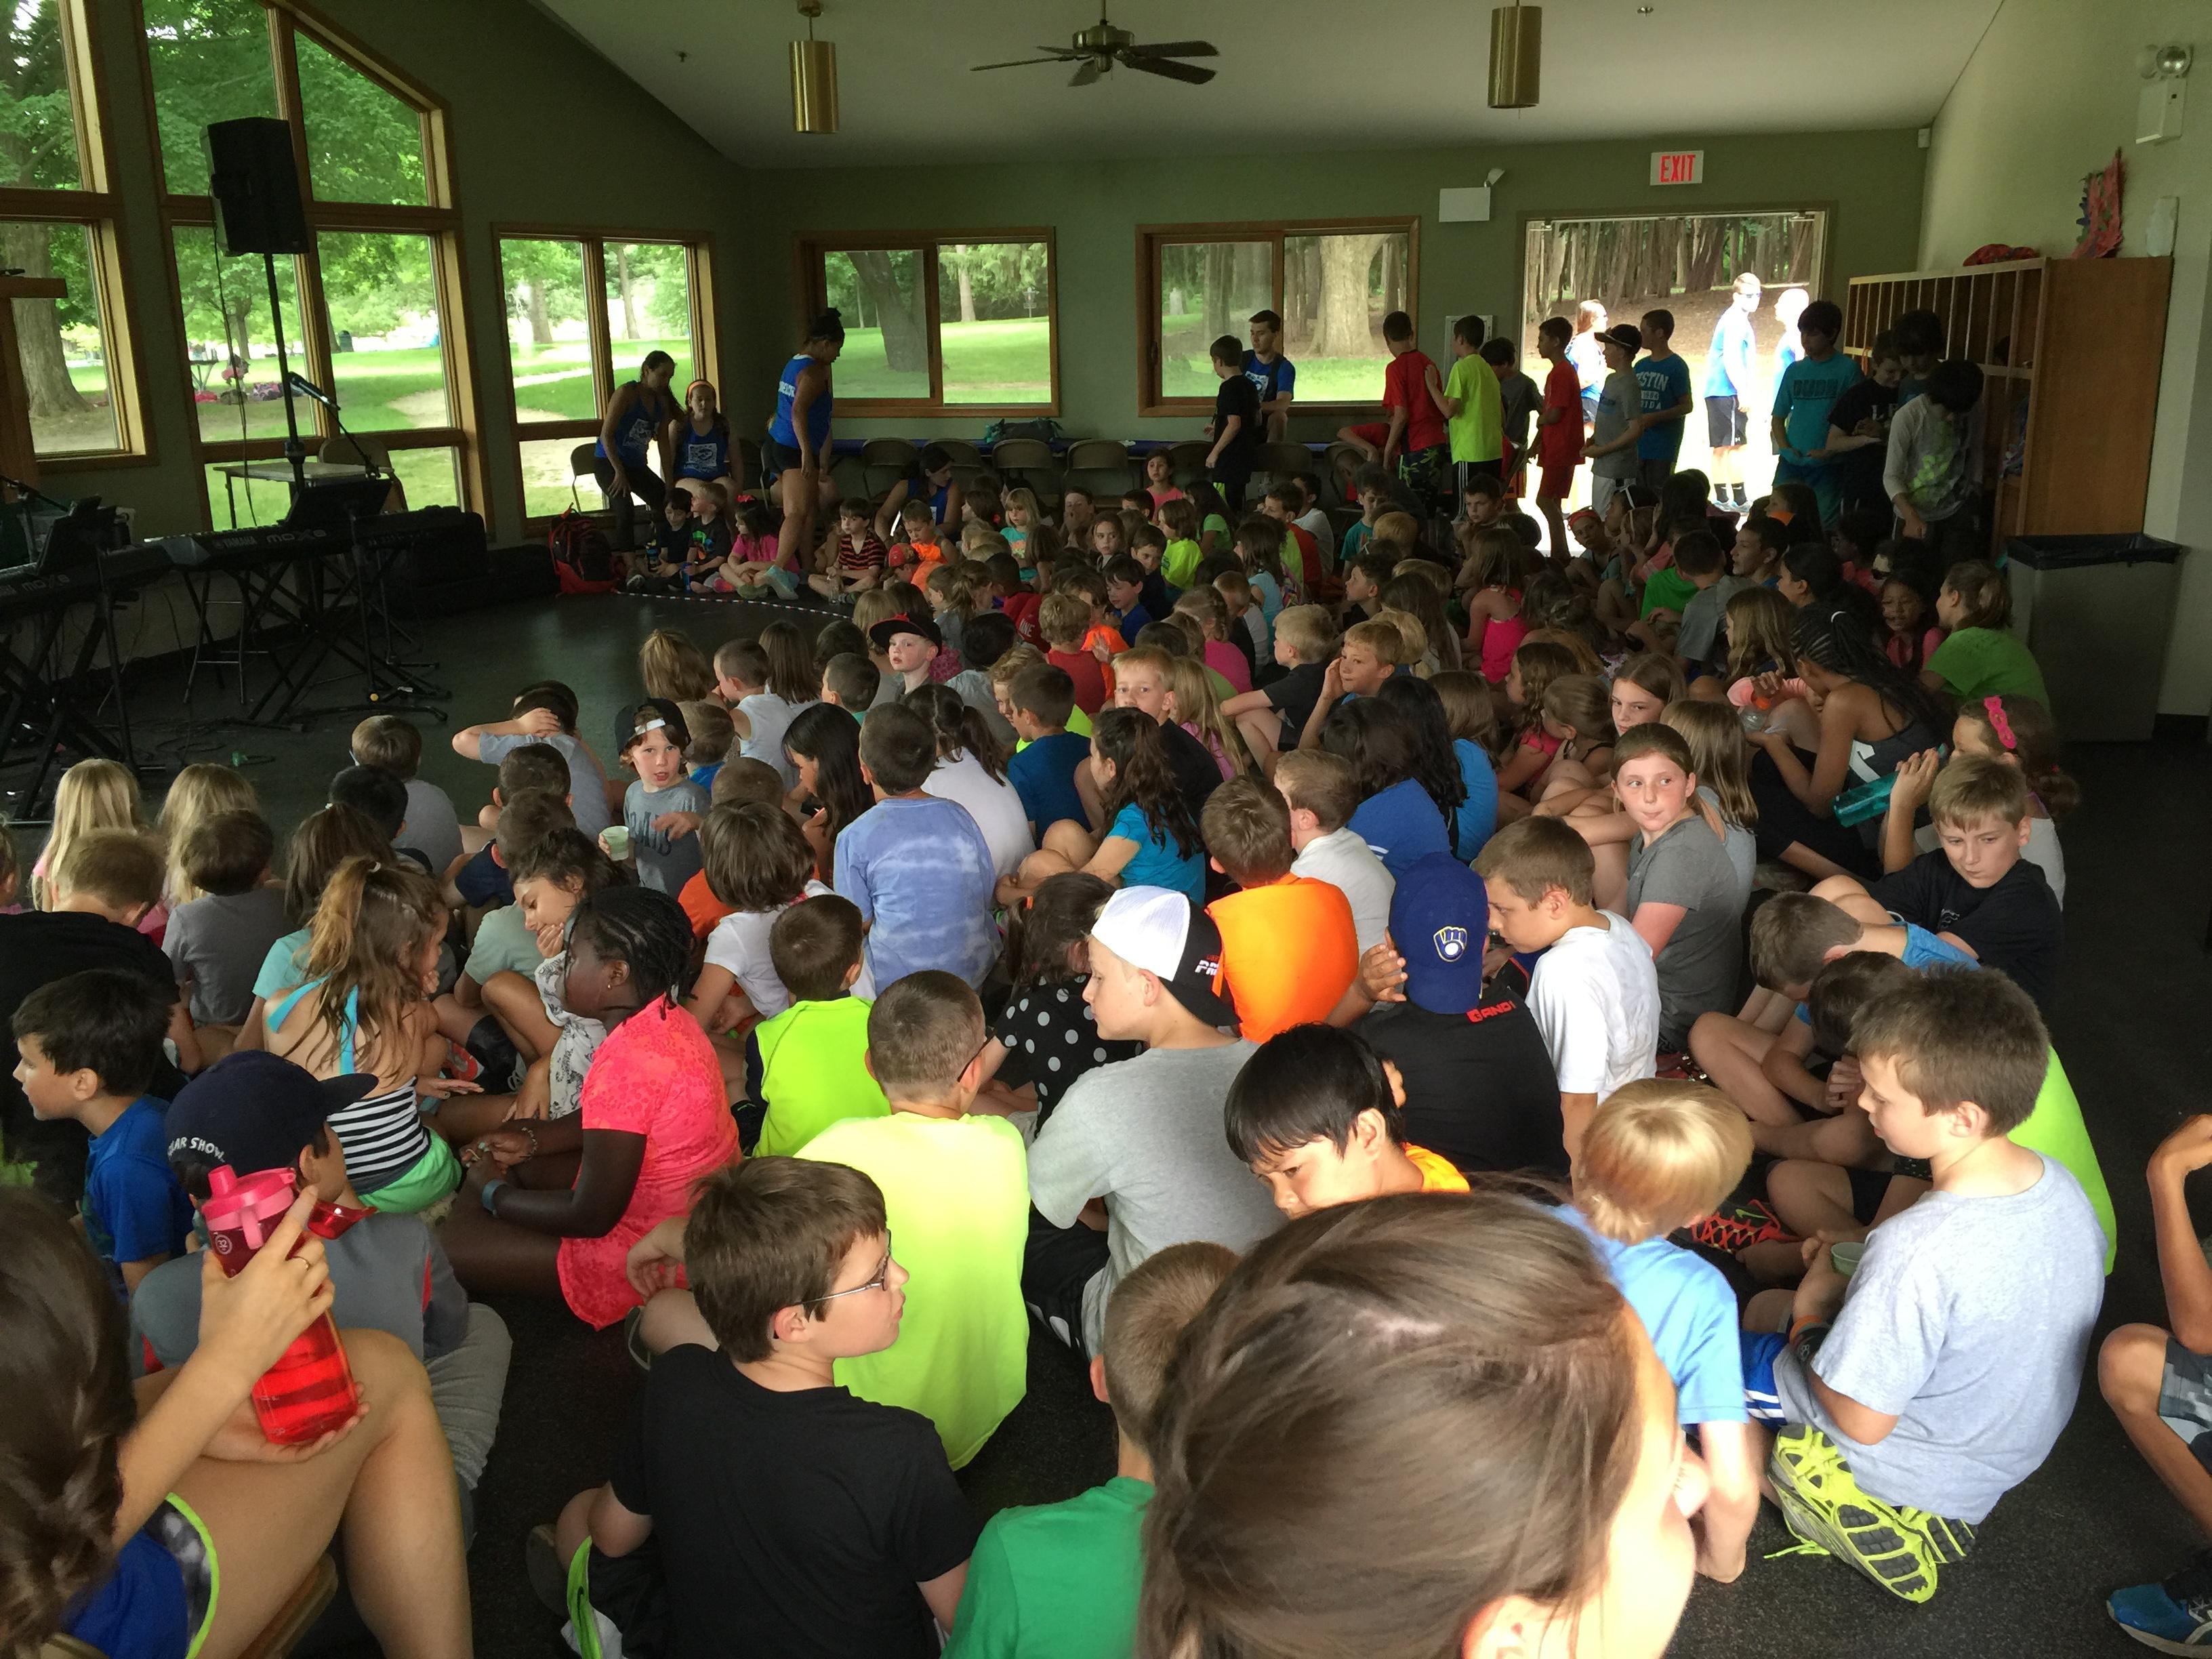 Dueling Pianos at Summer Camp